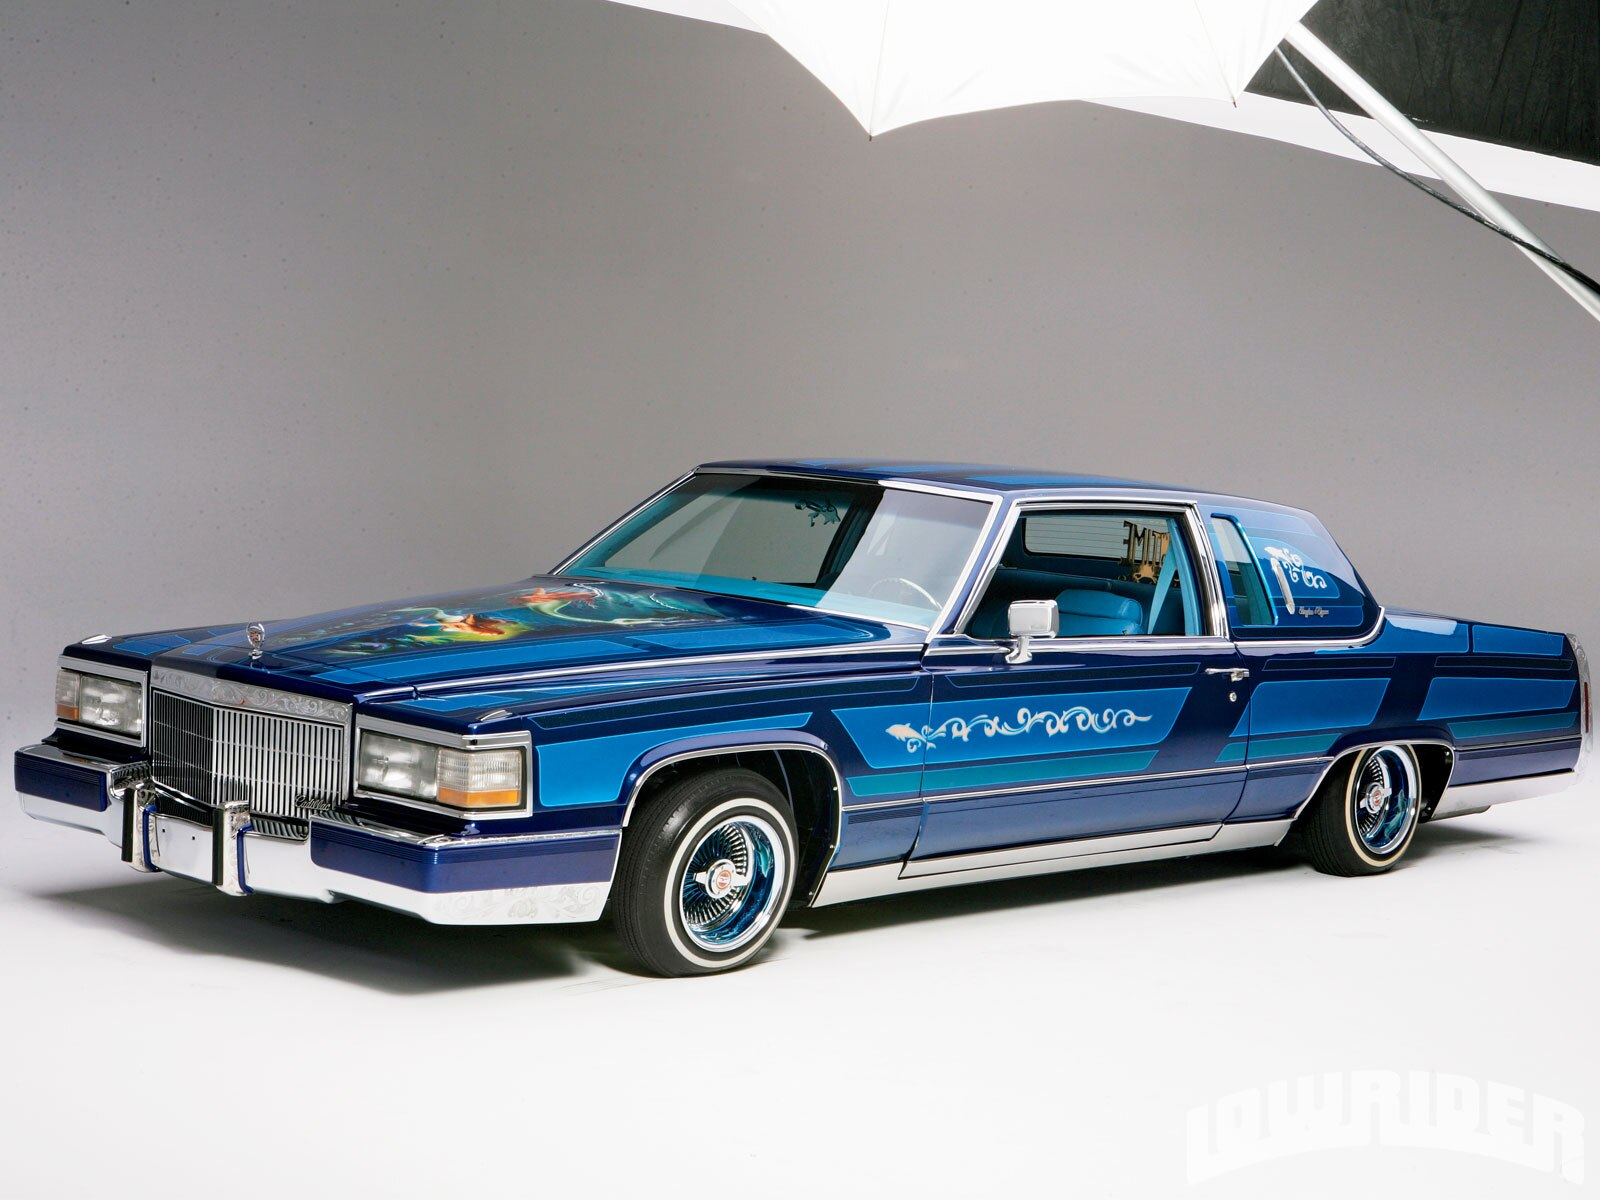 1984 Cadillac Fleetwood Brougham - Lowrider Magazine